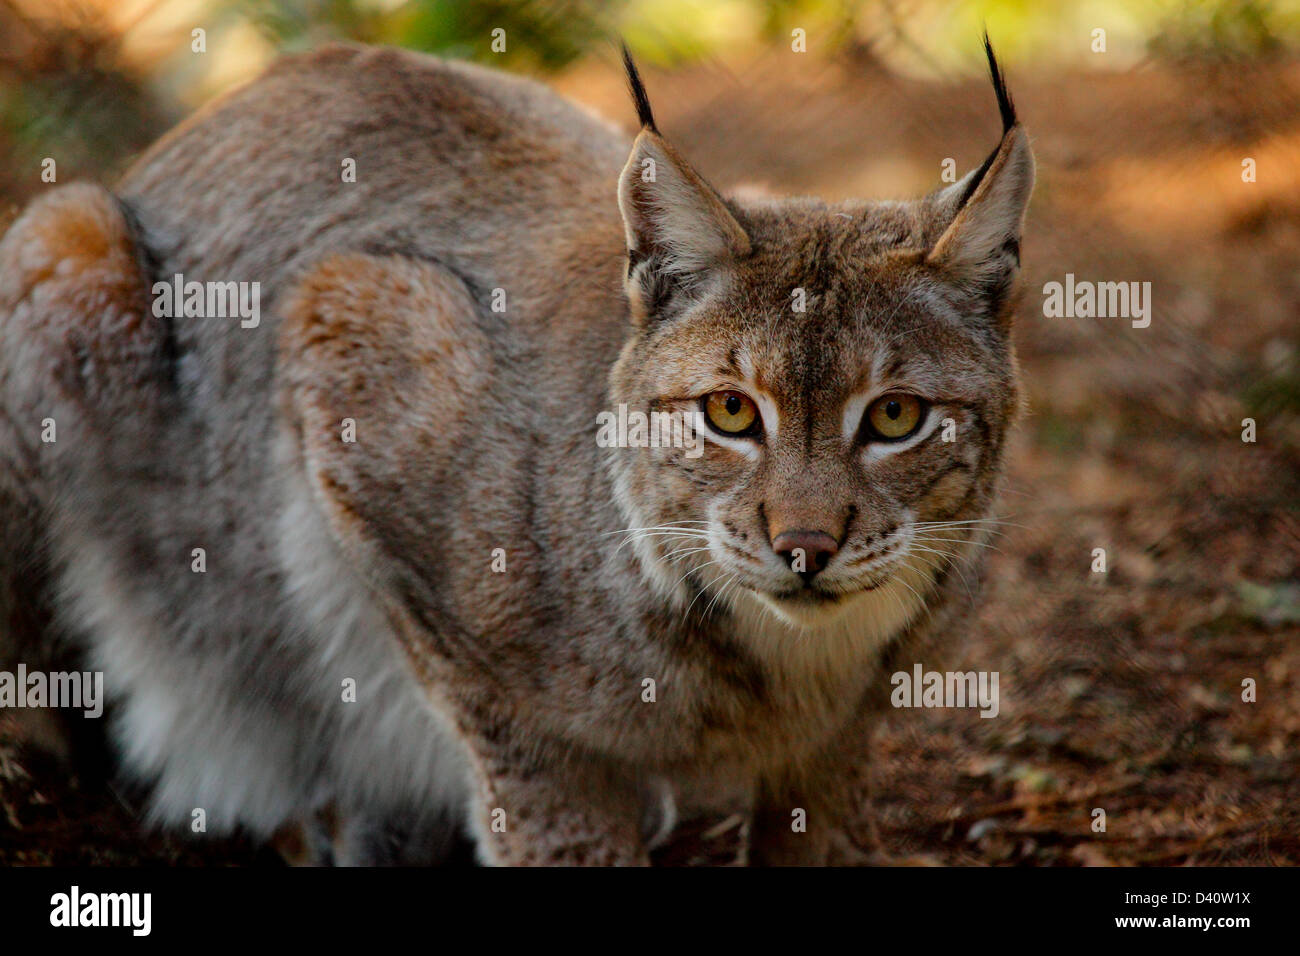 Eurasian lynx (Lynx lynx) - Stock Image